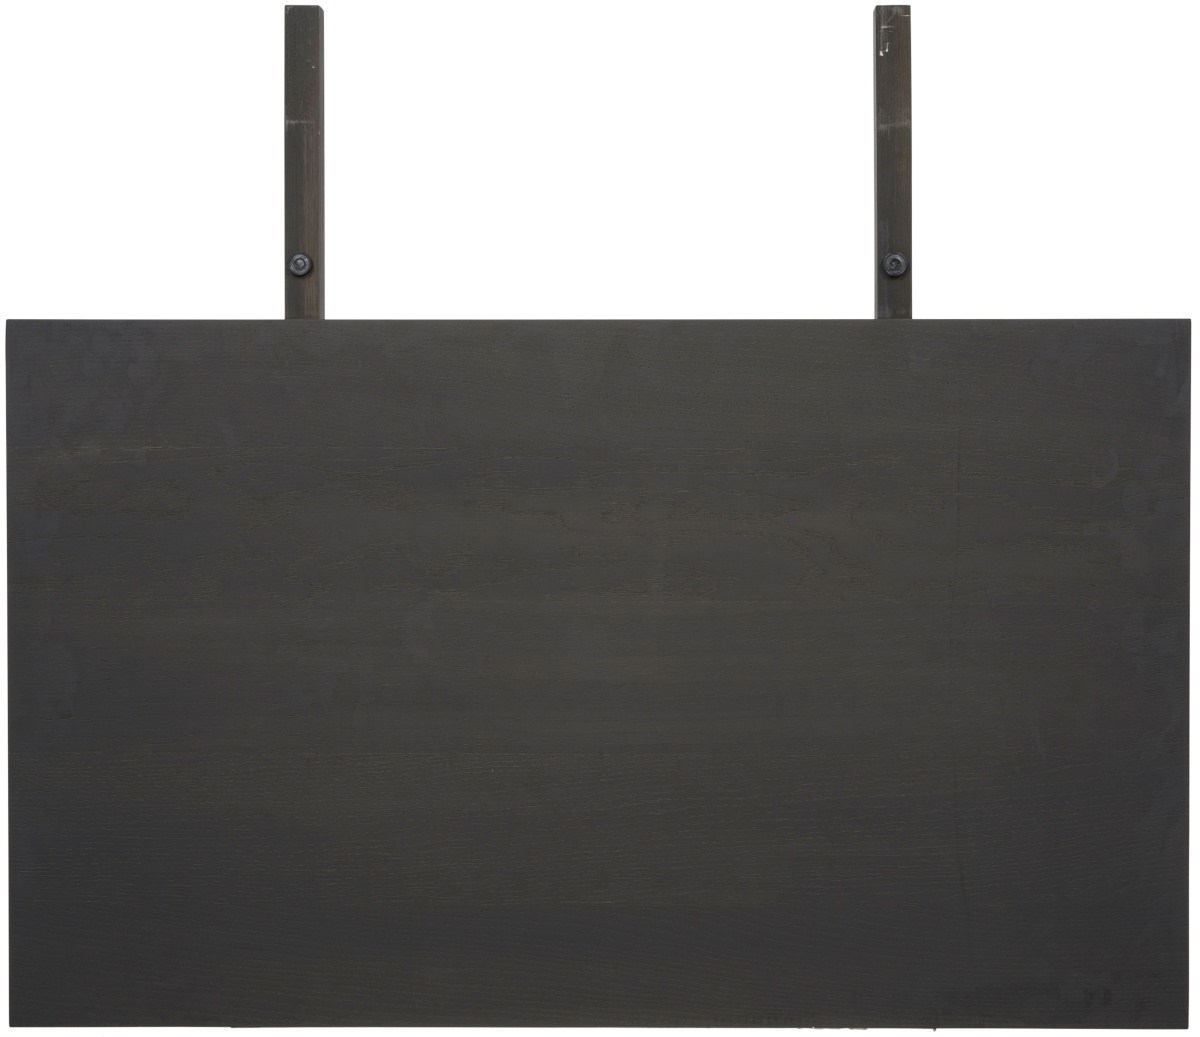 CANETT Aspen tillgsplade - antracitgr bejdset tr (80x45)